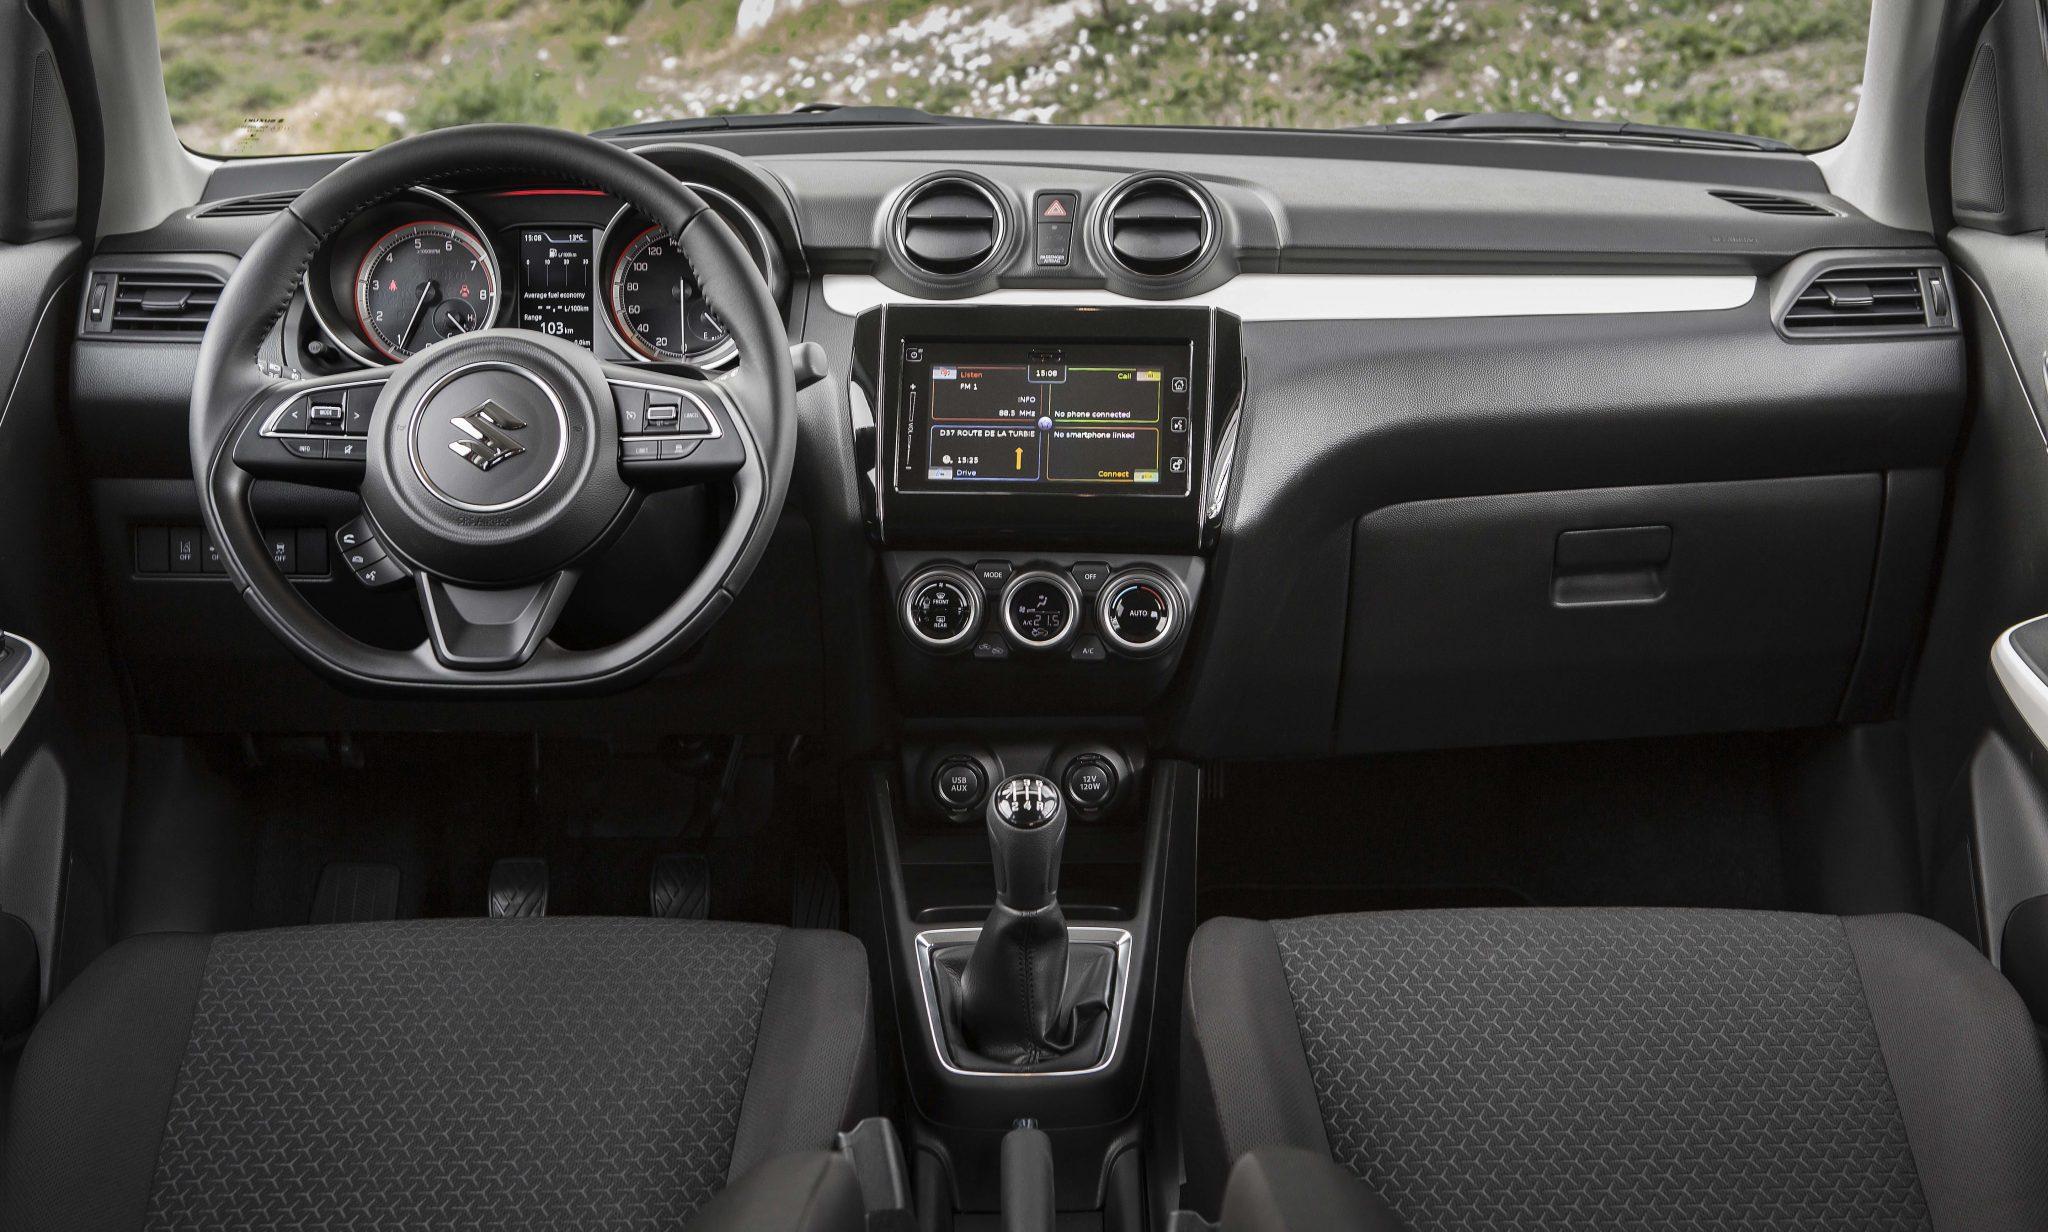 Suzuki Swift 1.0 Boosterjet Smart Hybrid Stijl